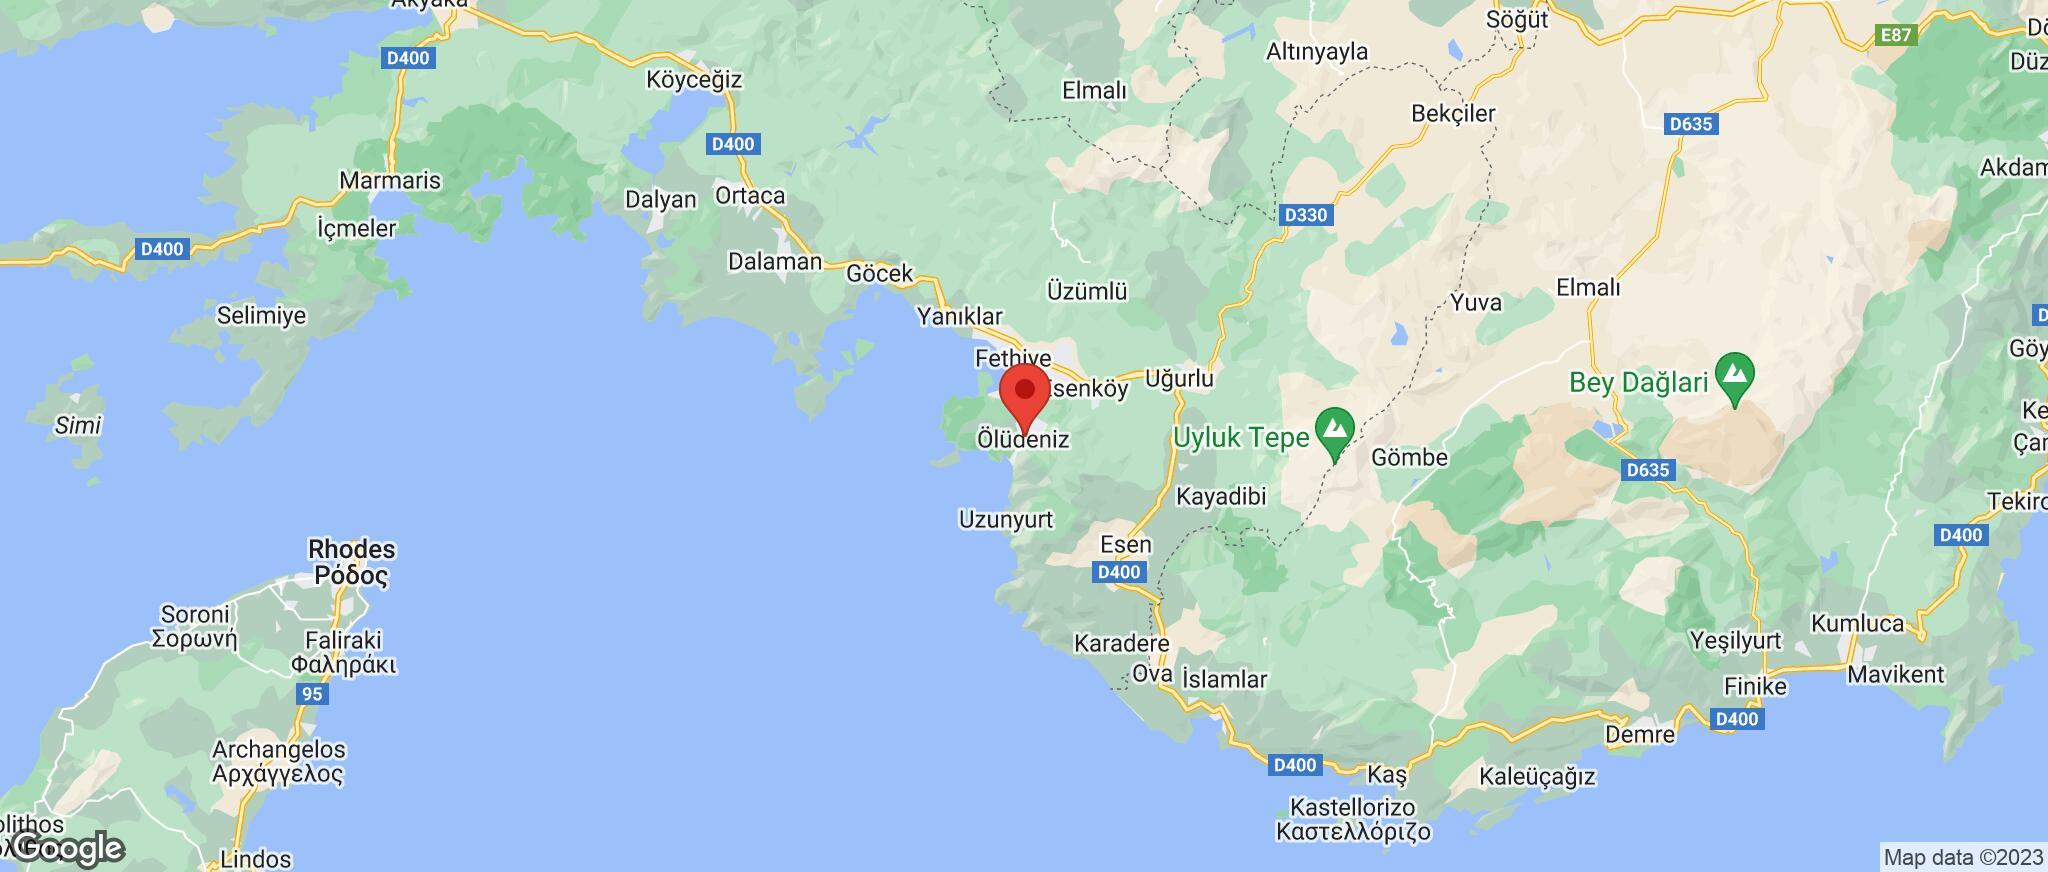 Map showing the location of Olu Deniz